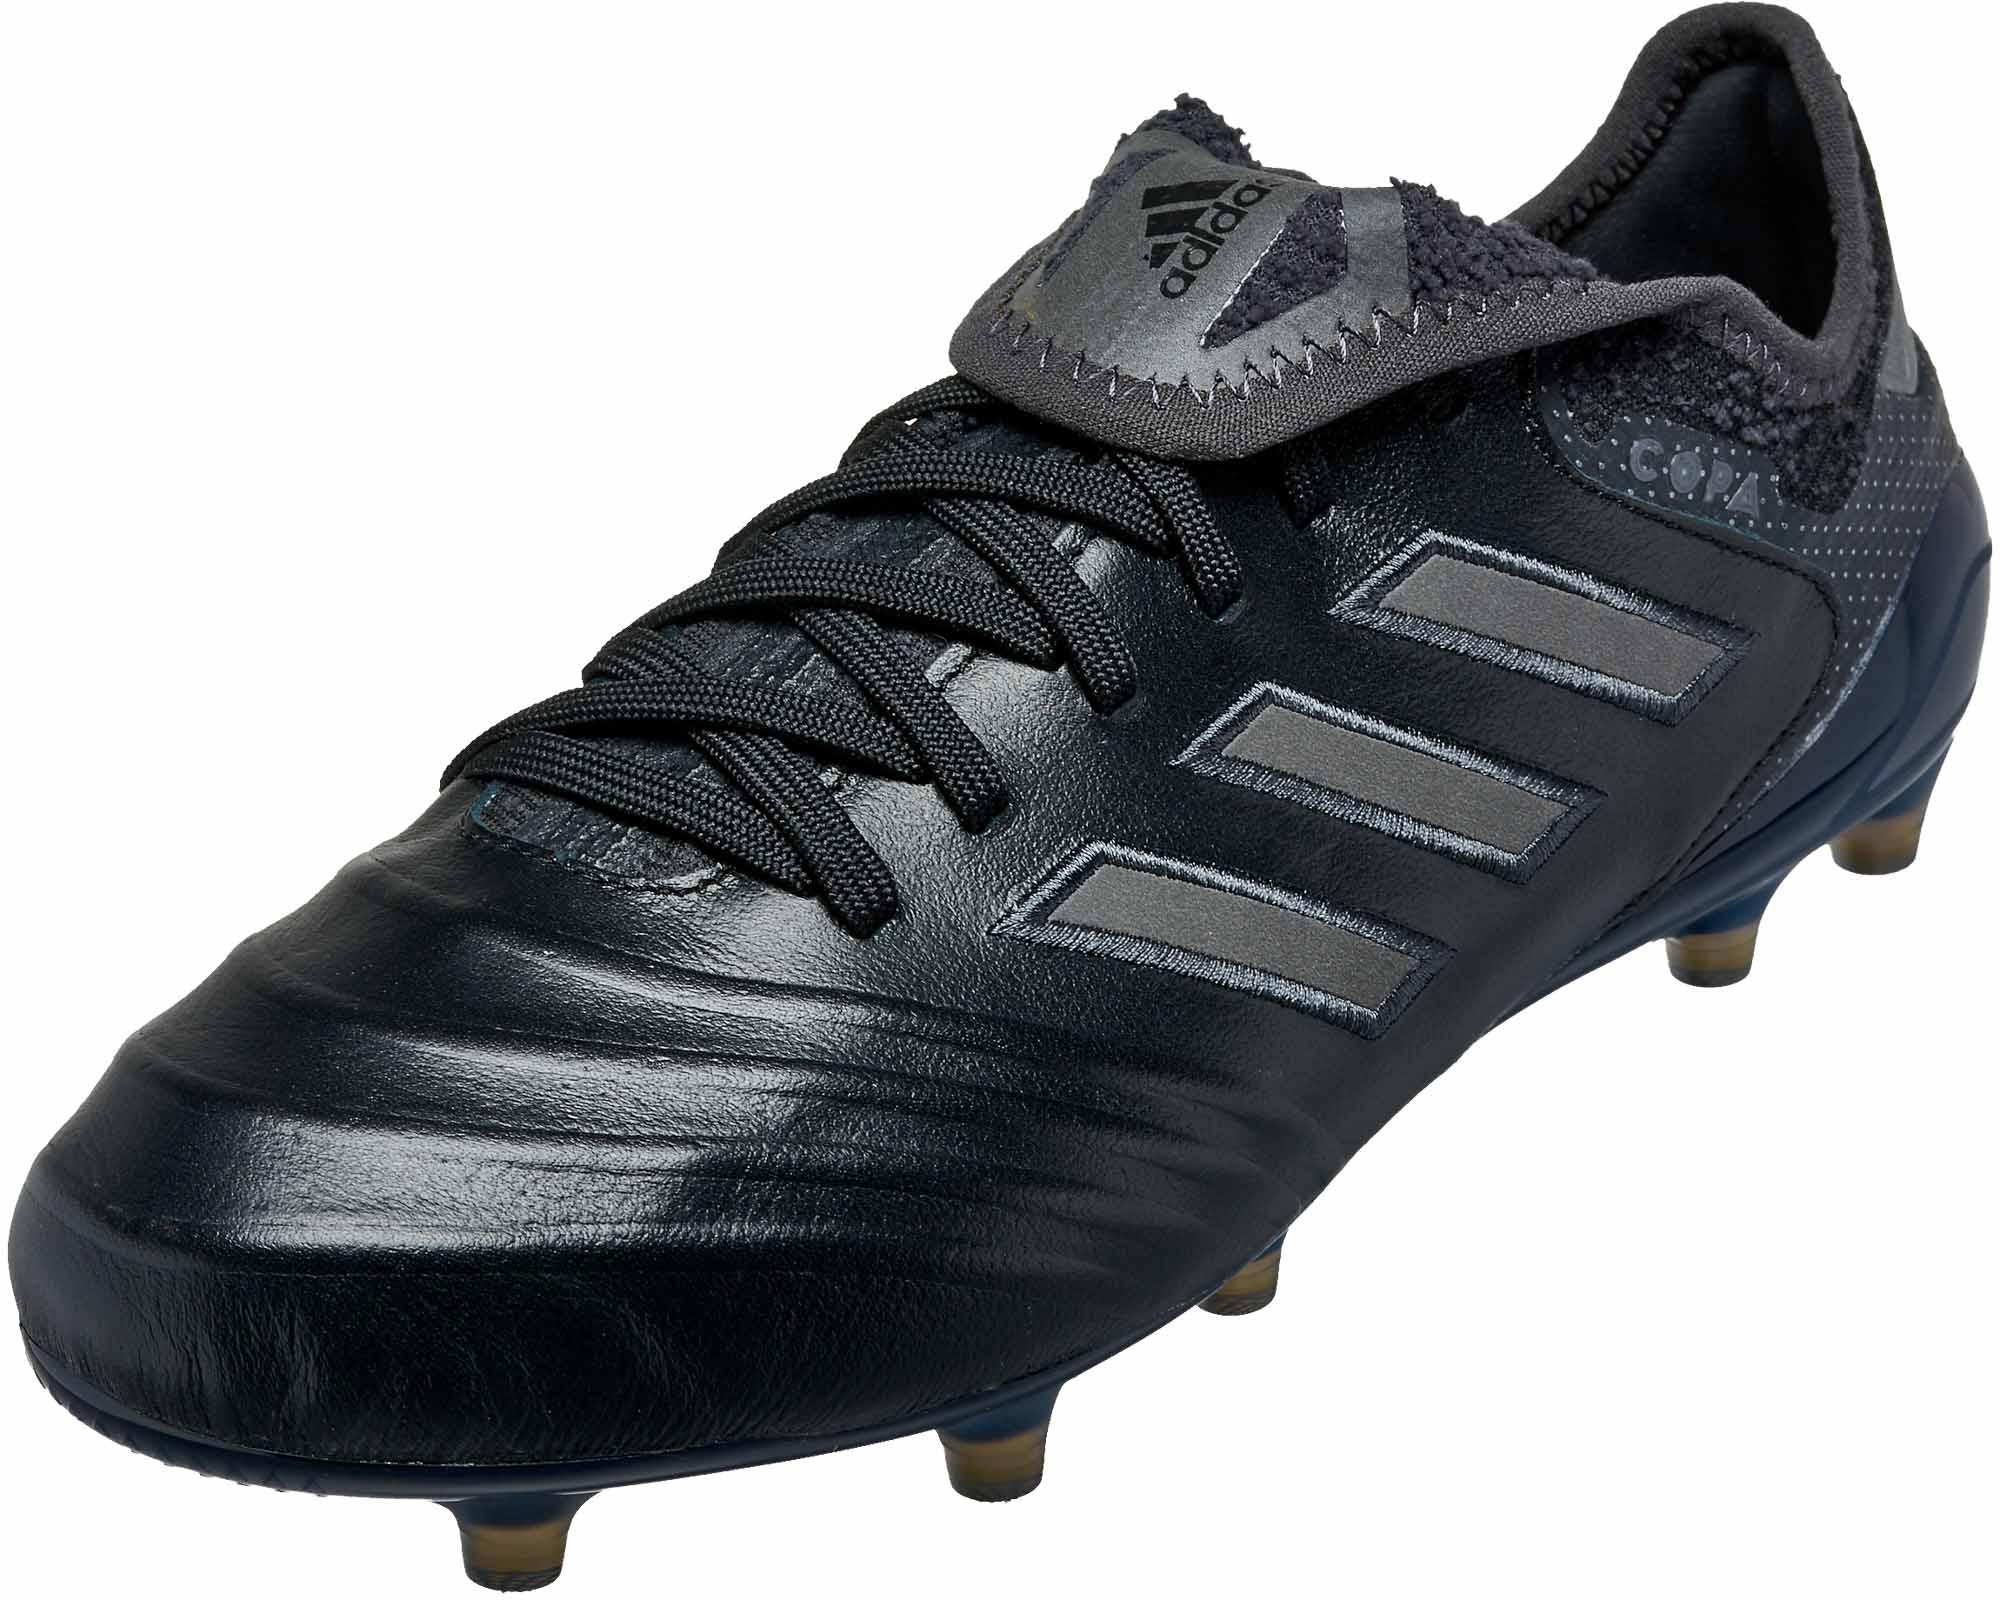 adidas Copa 18.1 FG - Black adidas Copa Soccer Cleats